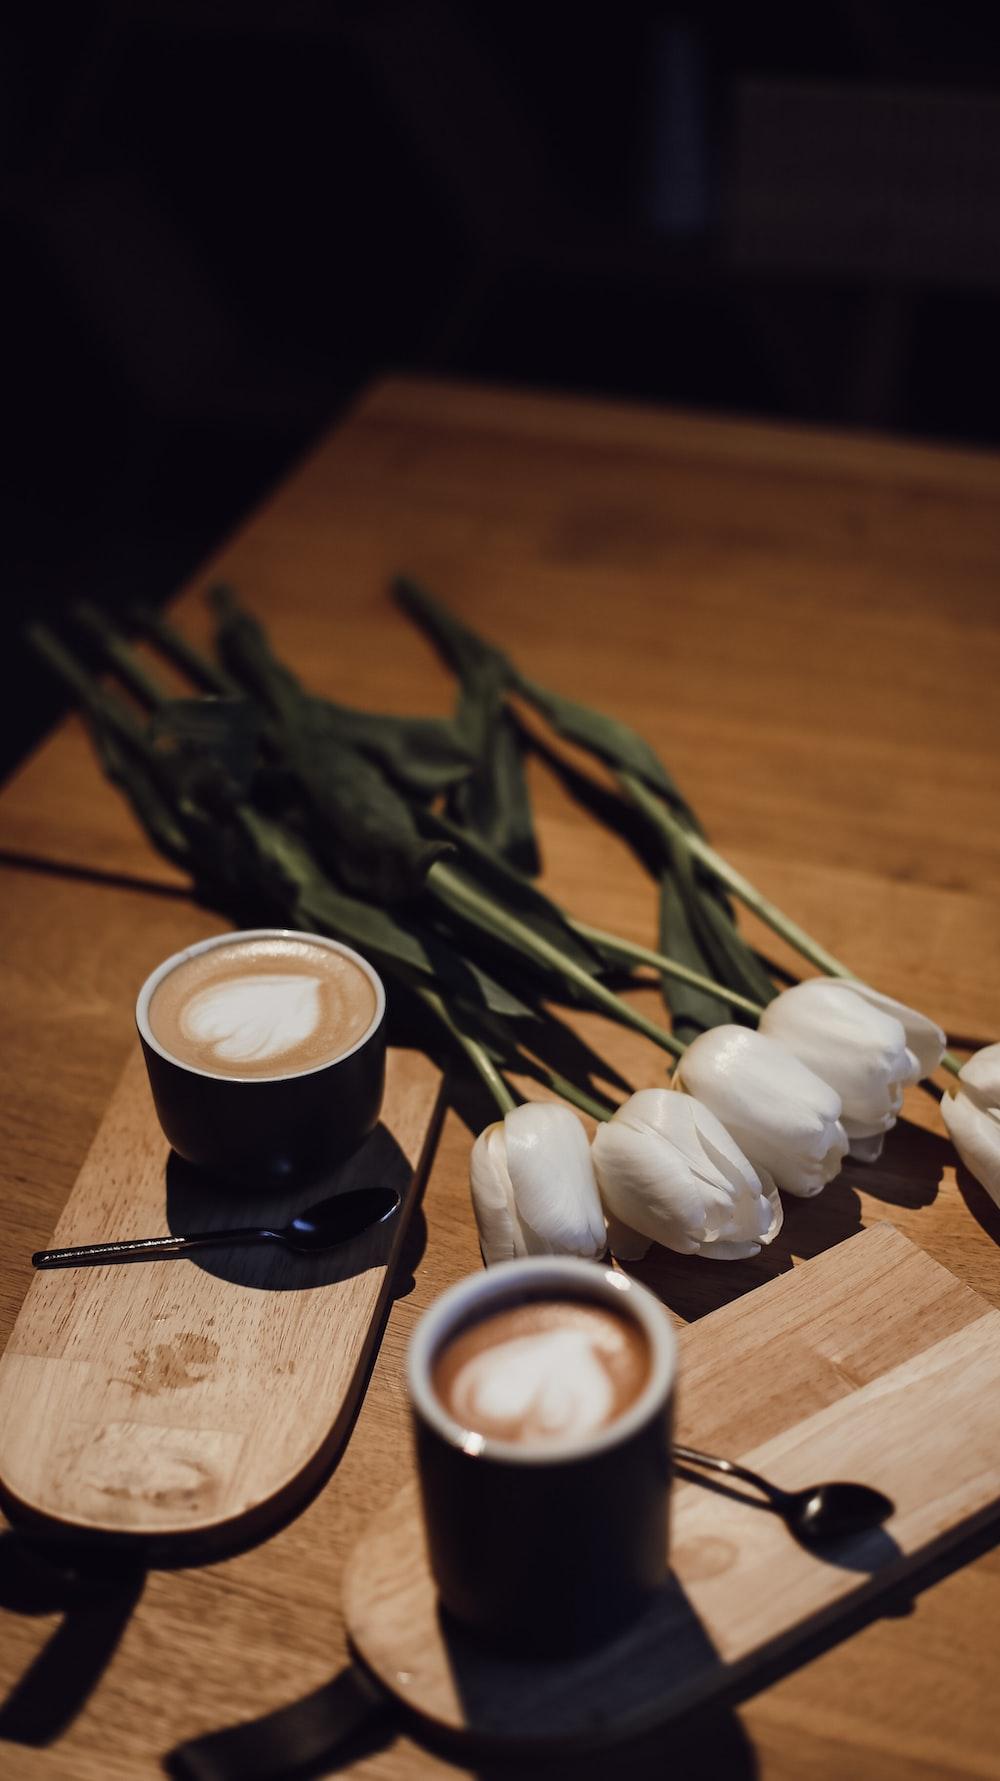 black ceramic mug with coffee beside white garlic and black and white ceramic mug on brown